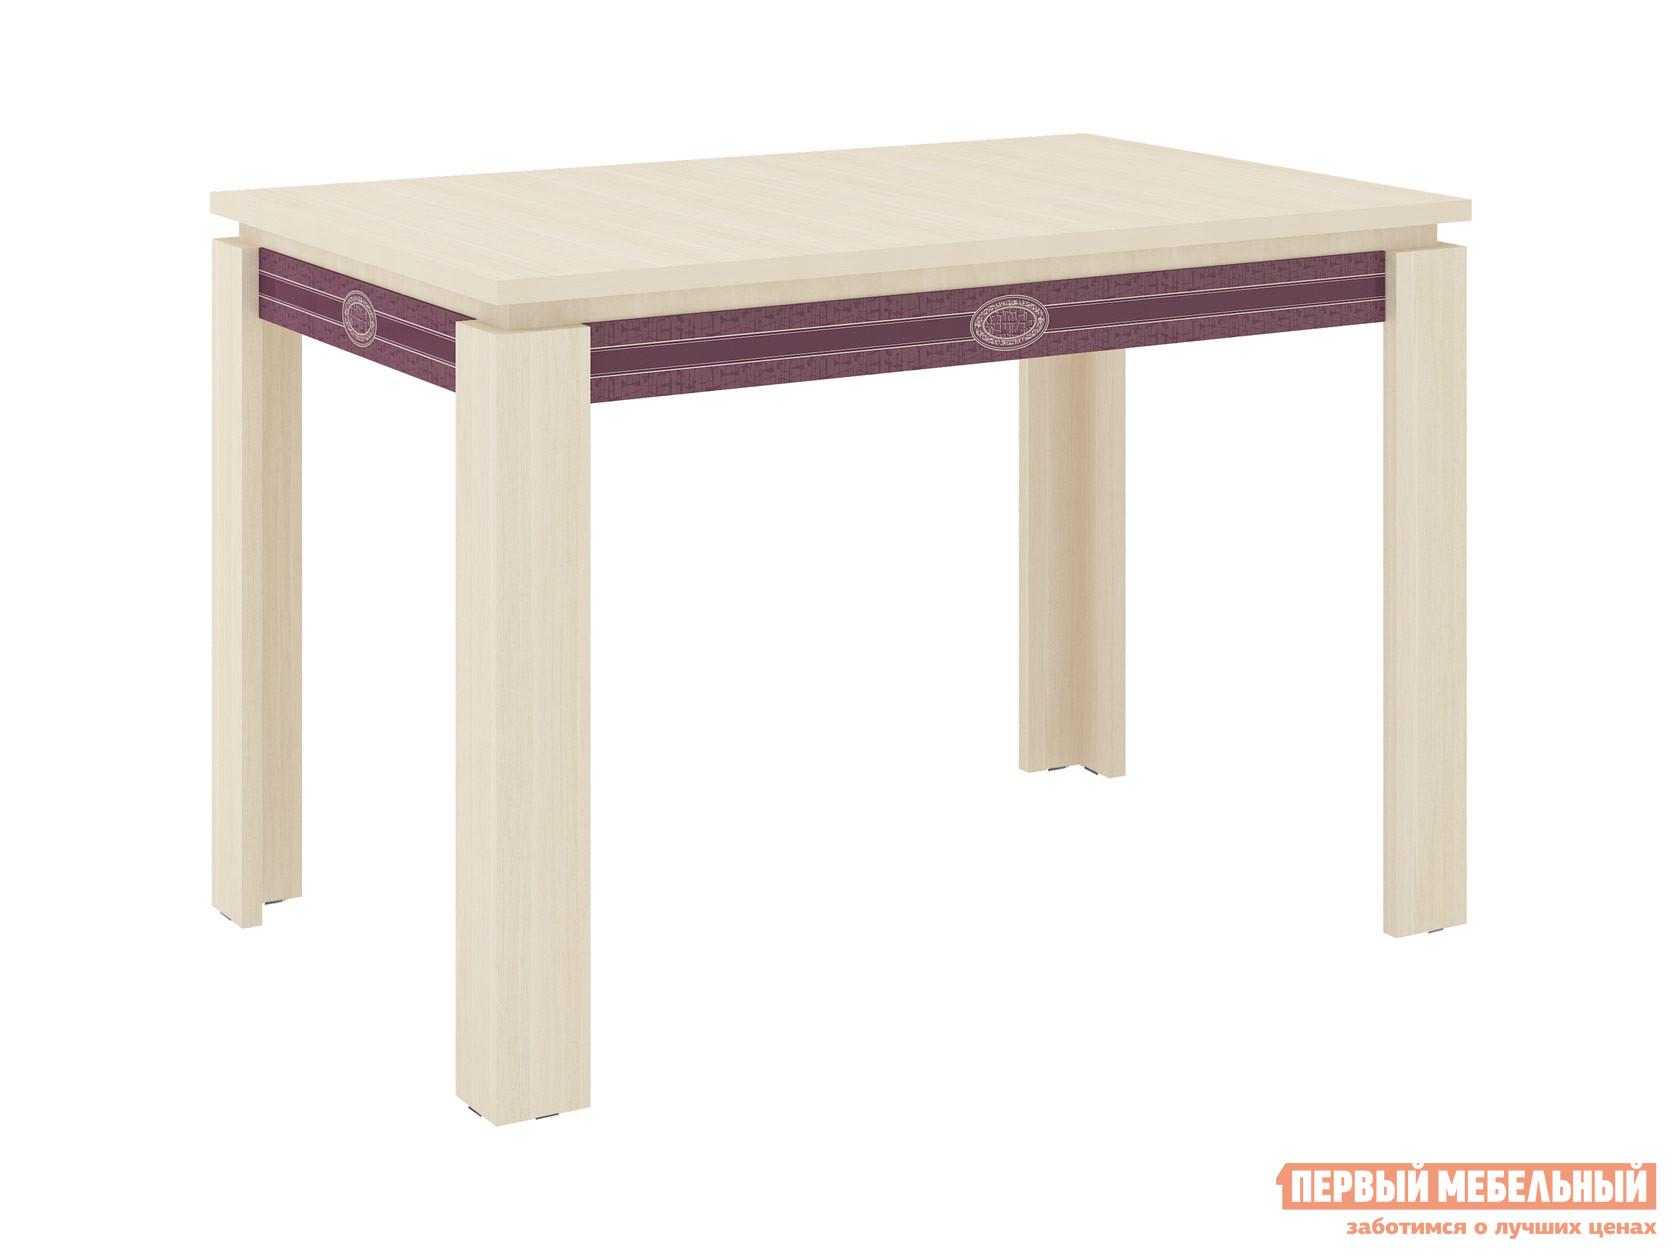 Обеденный стол Витра Орфей-15.12 обеденный стол трансформер витра орфей 16